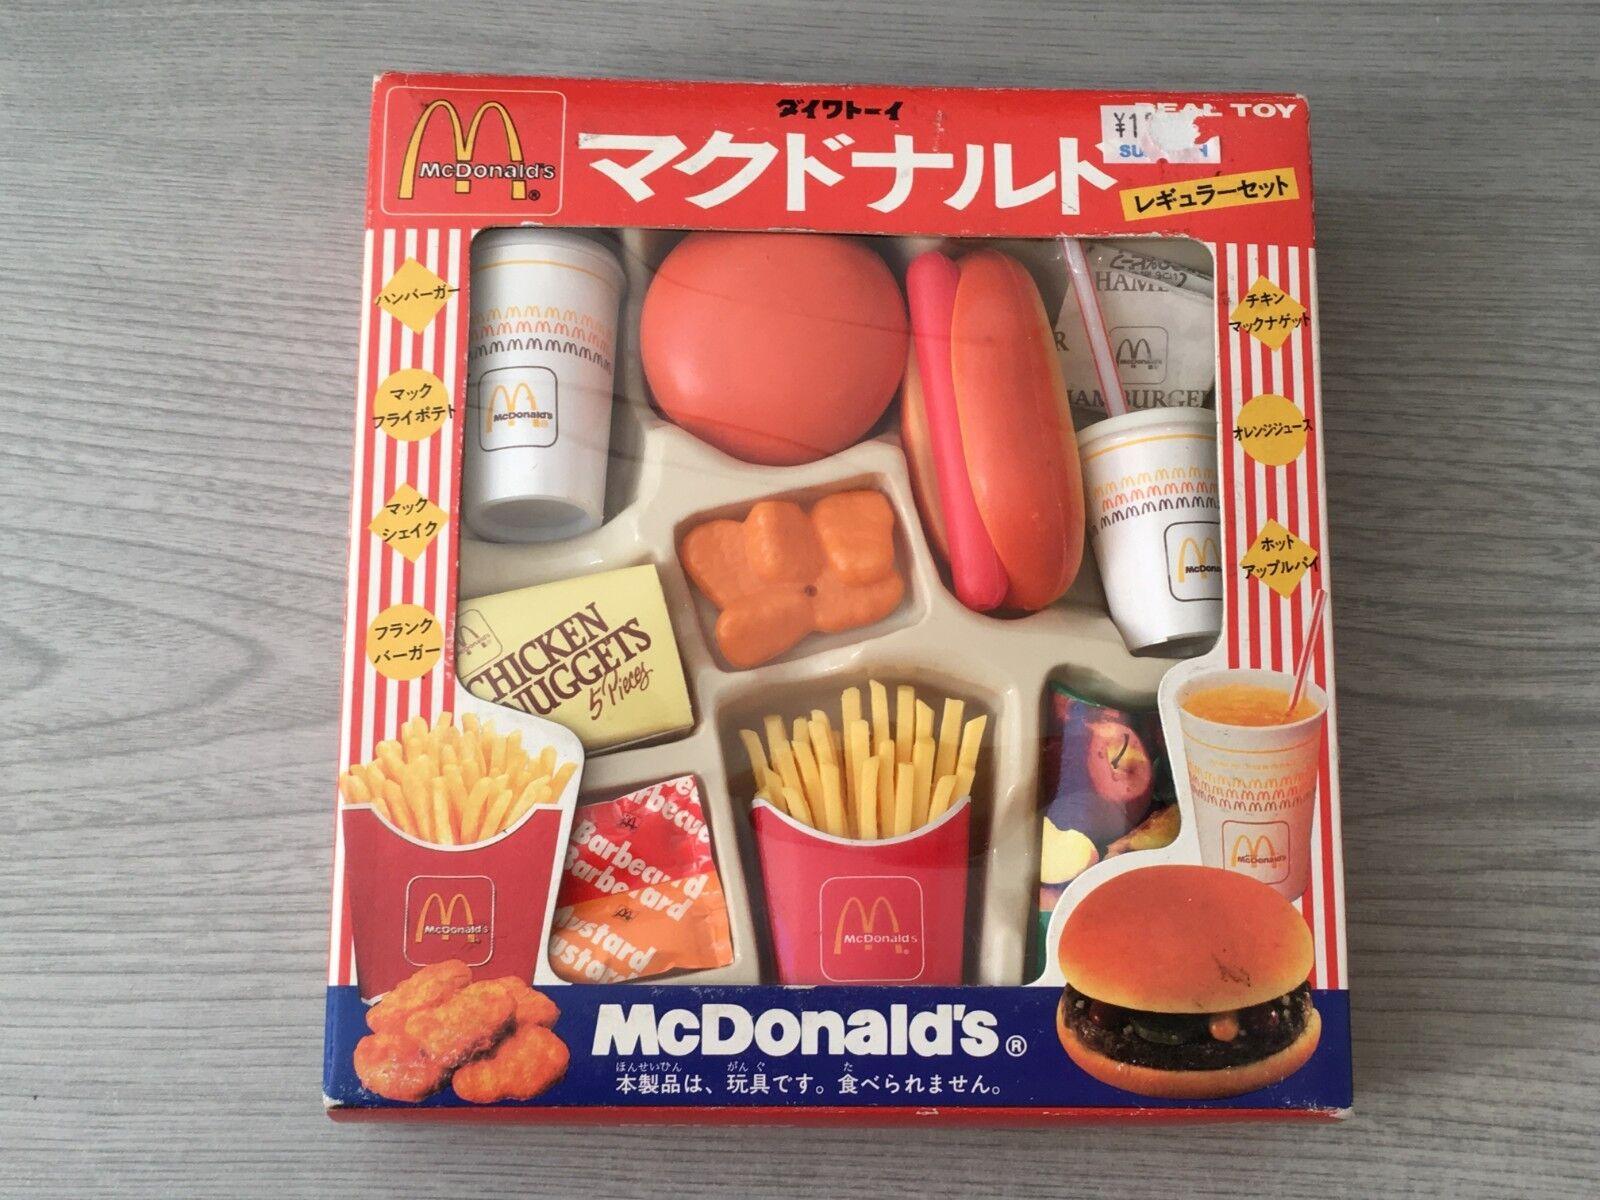 RARE Vintage 1995 New Boxed Japanese McDonald's Plastic Toy Food Set Hamburger